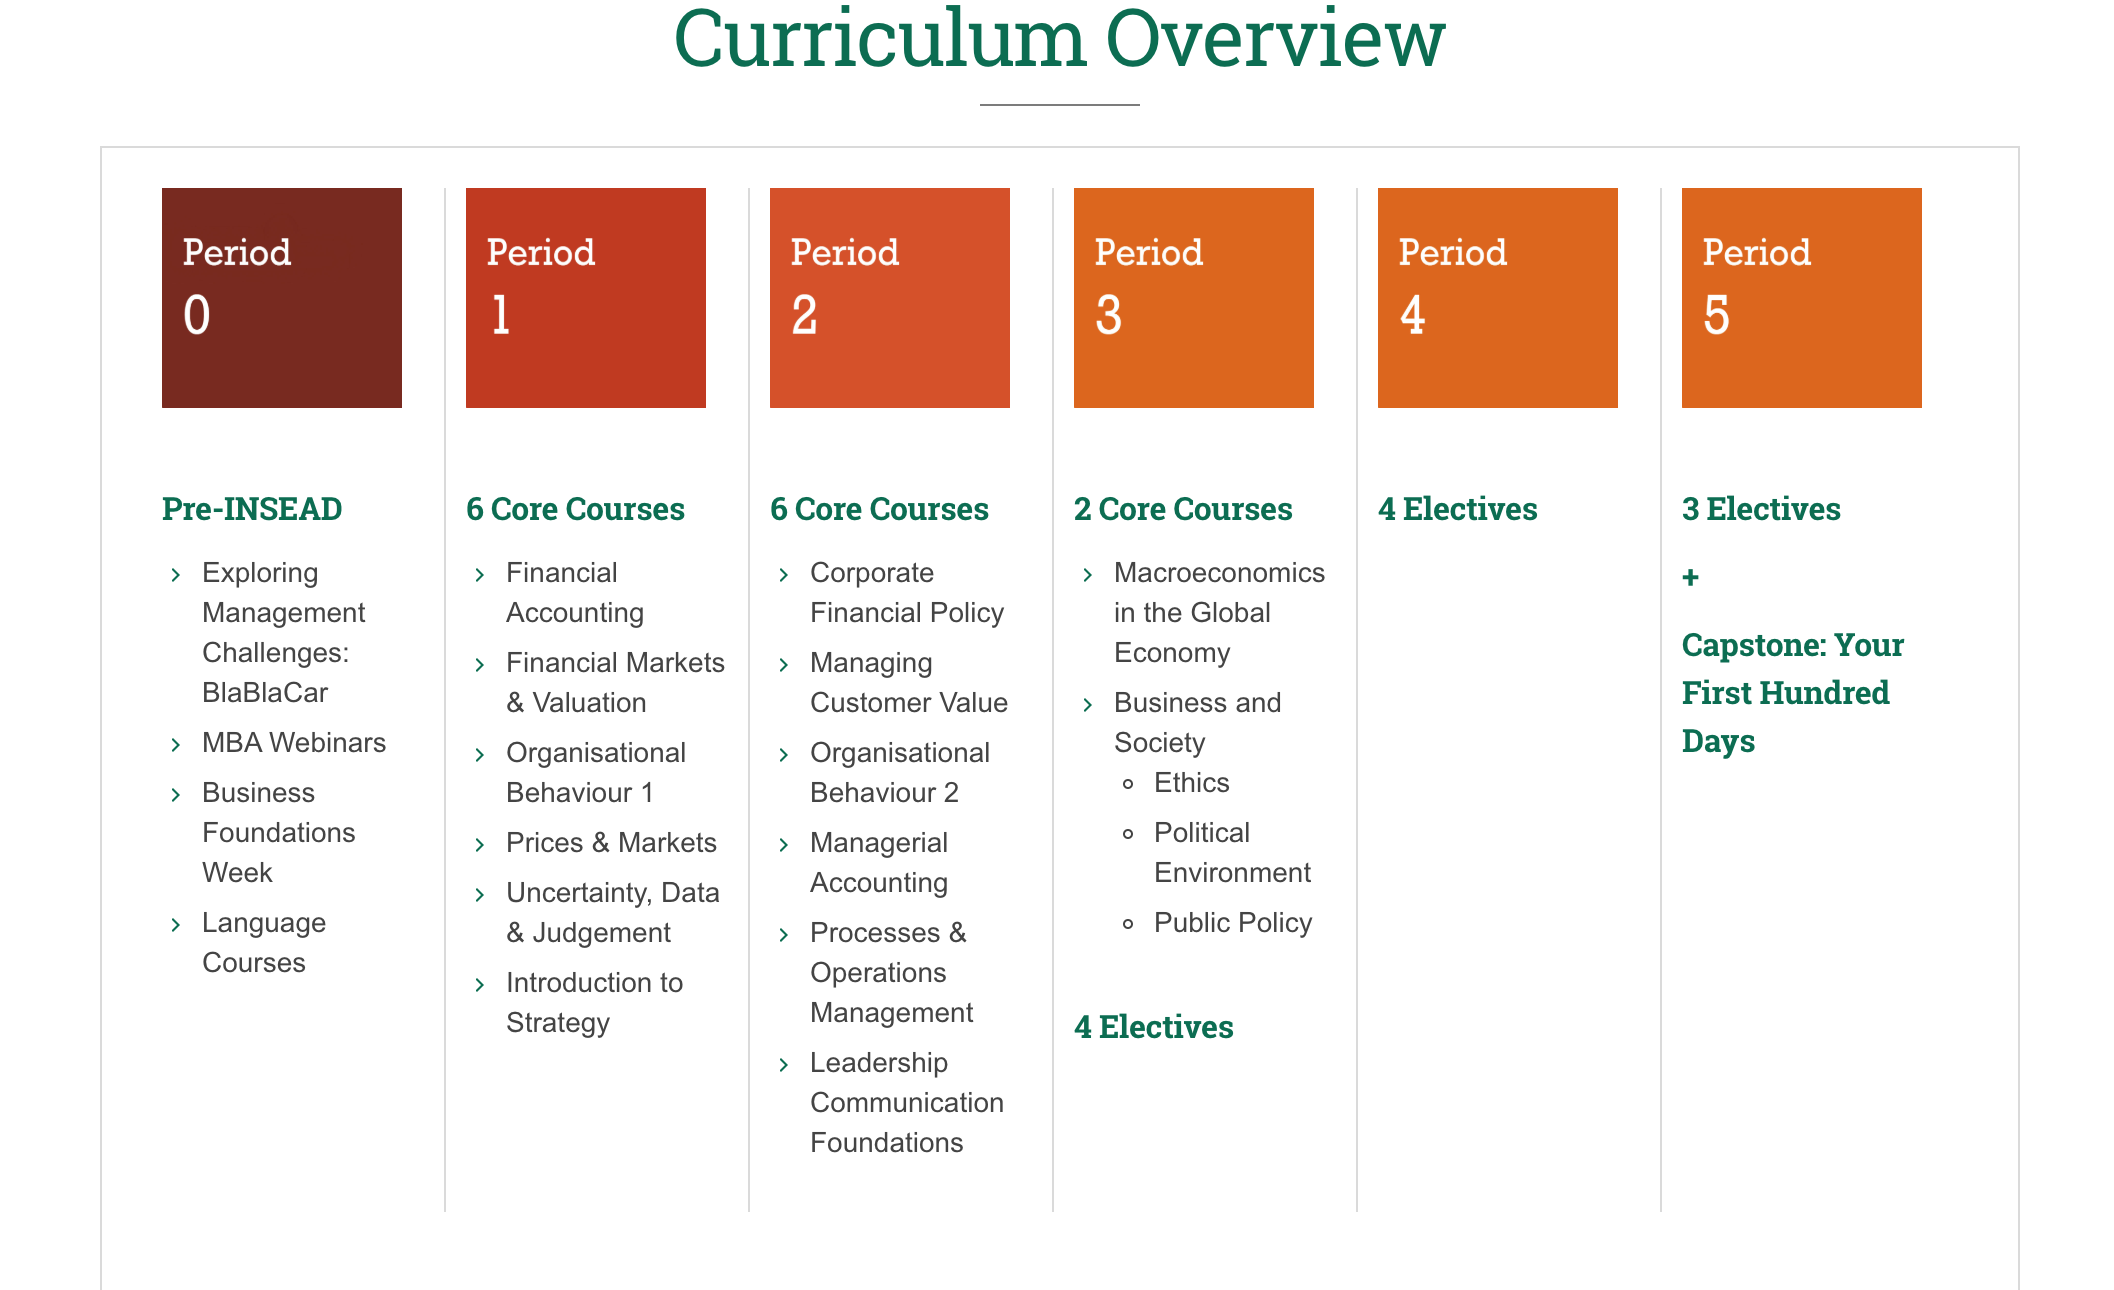 INSEAD MBA Program - Curriculum Overview